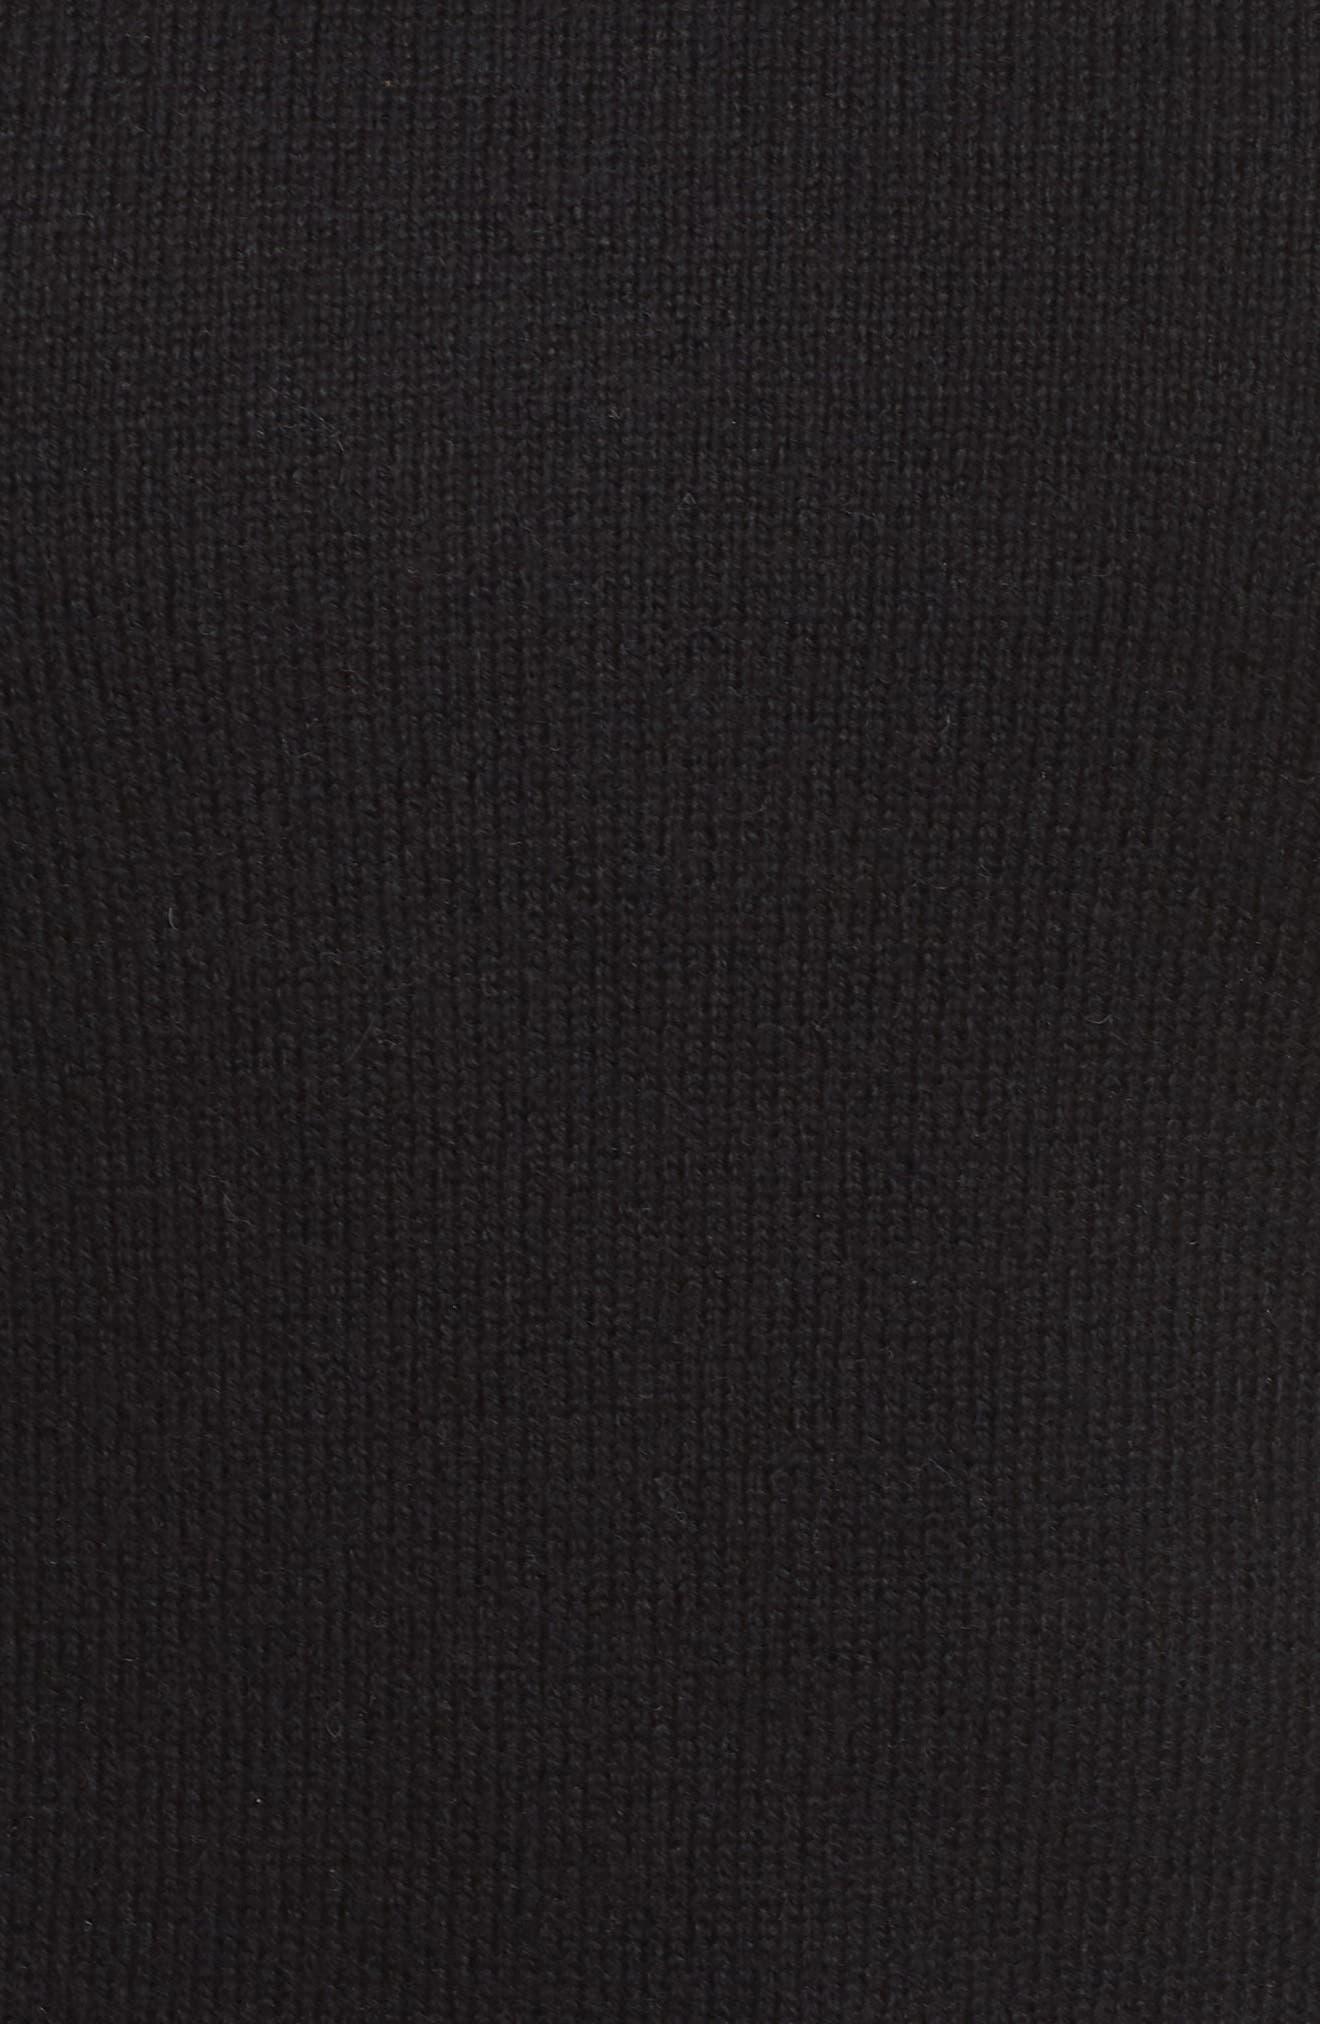 Braided Crewneck Sweater,                             Alternate thumbnail 5, color,                             011